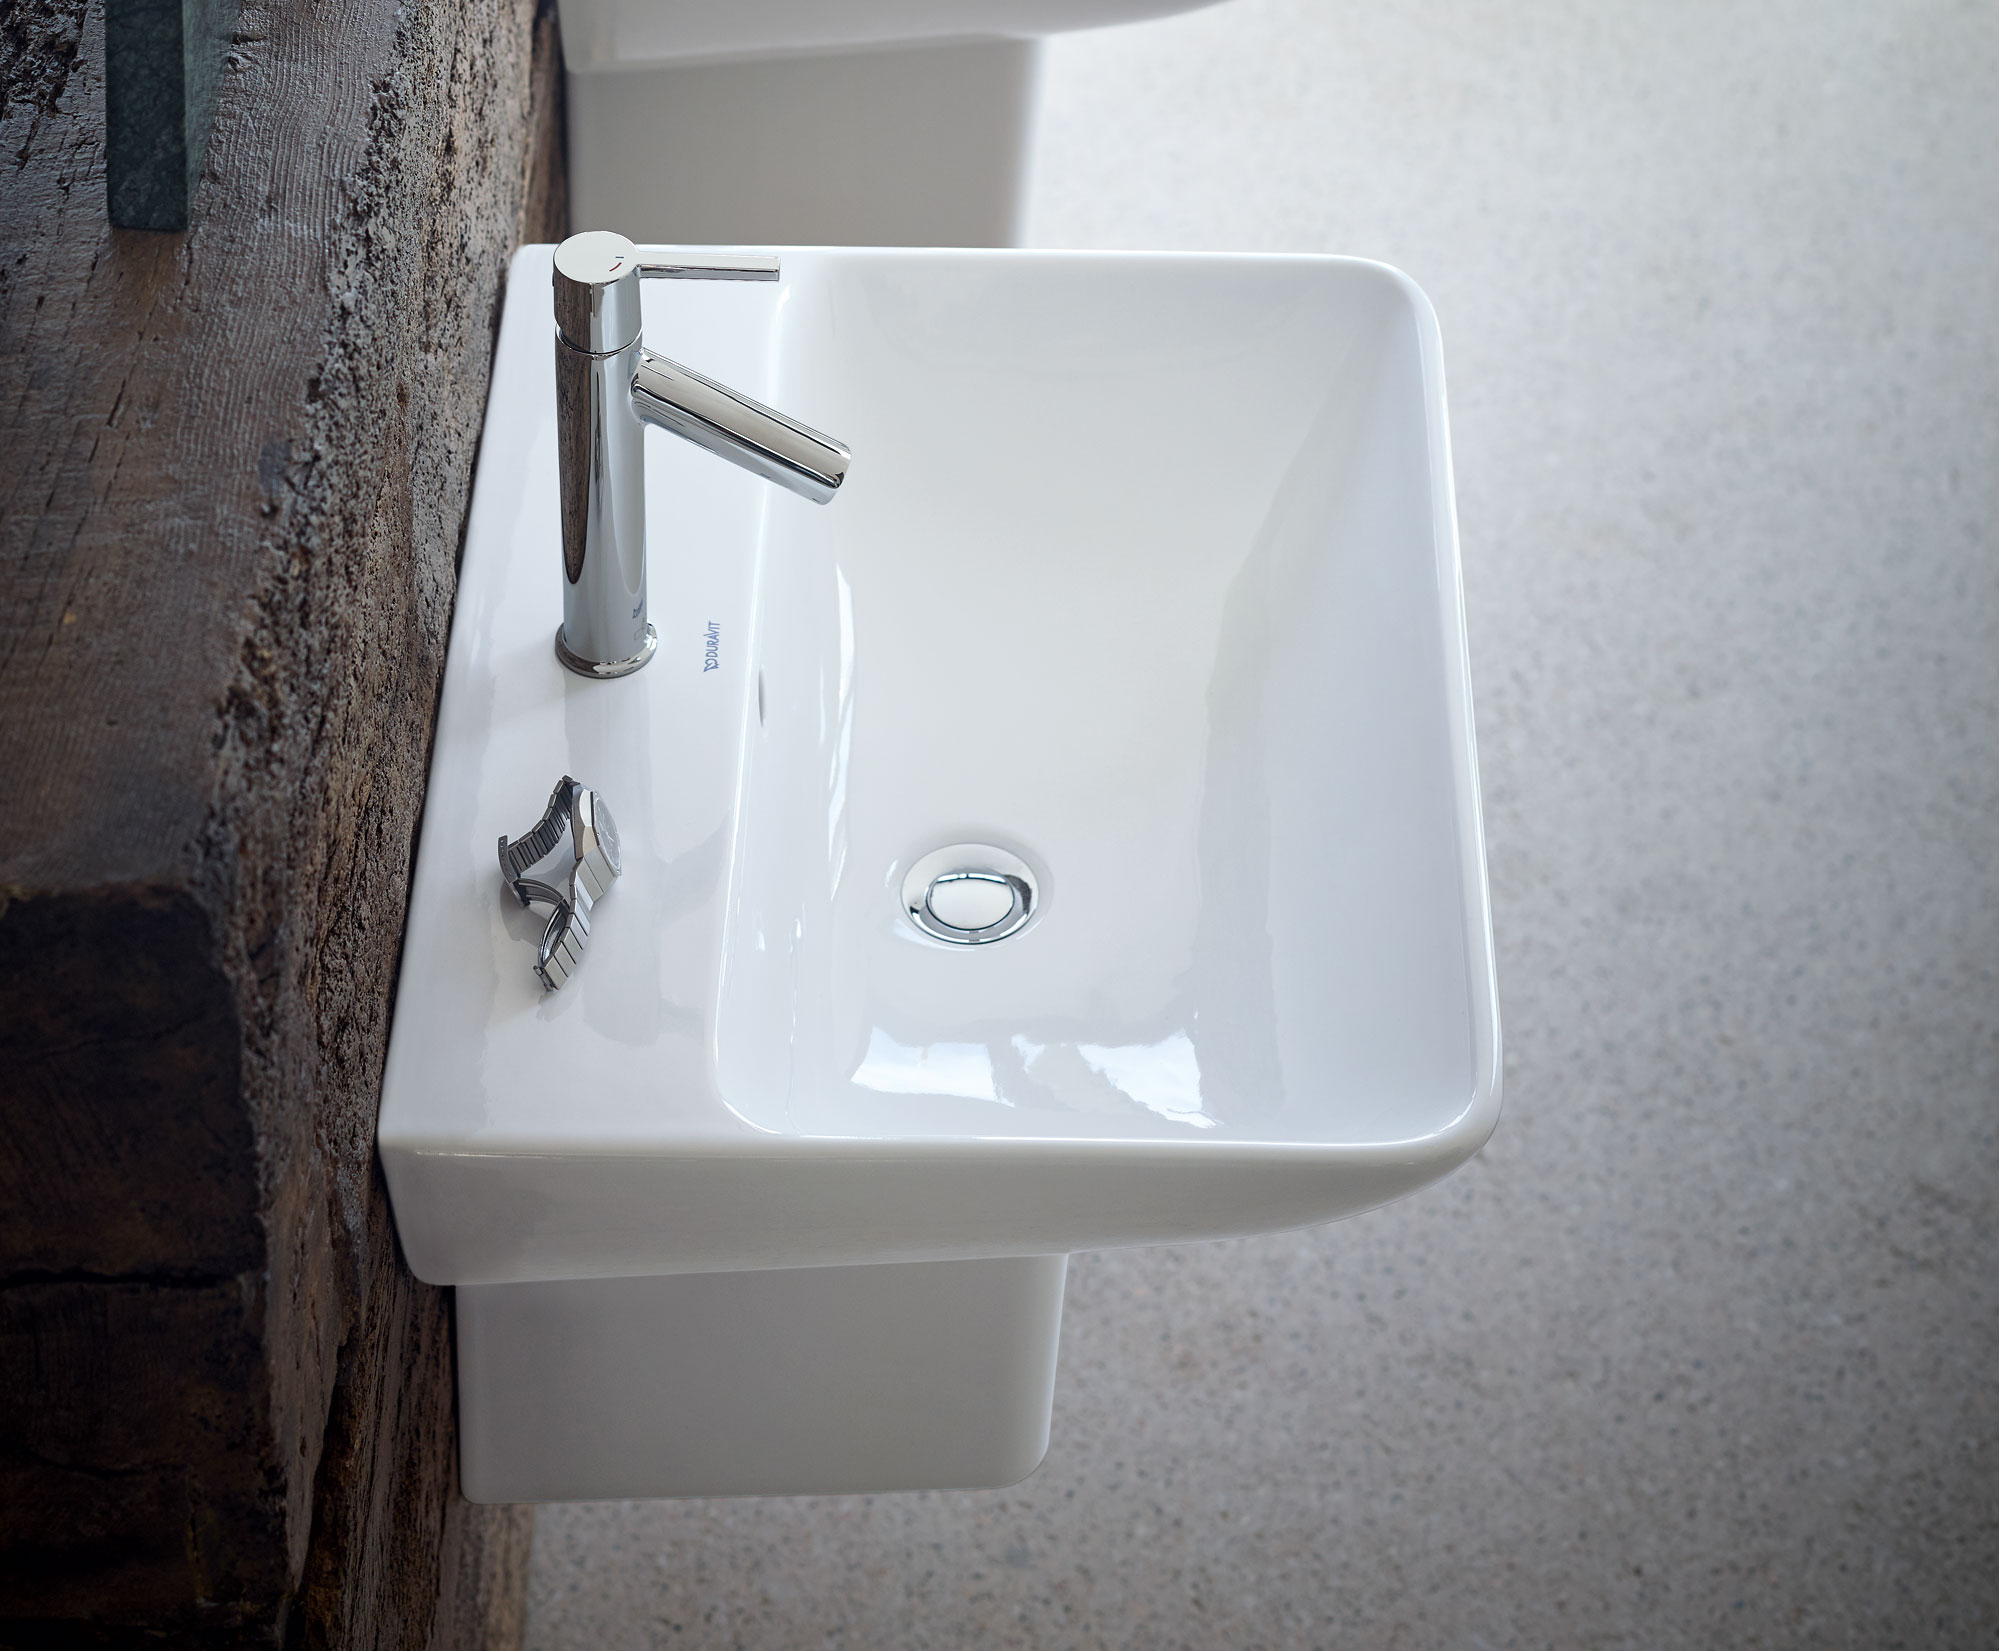 Starck 2 lavabo 232355 duravit for Lavabo profundo